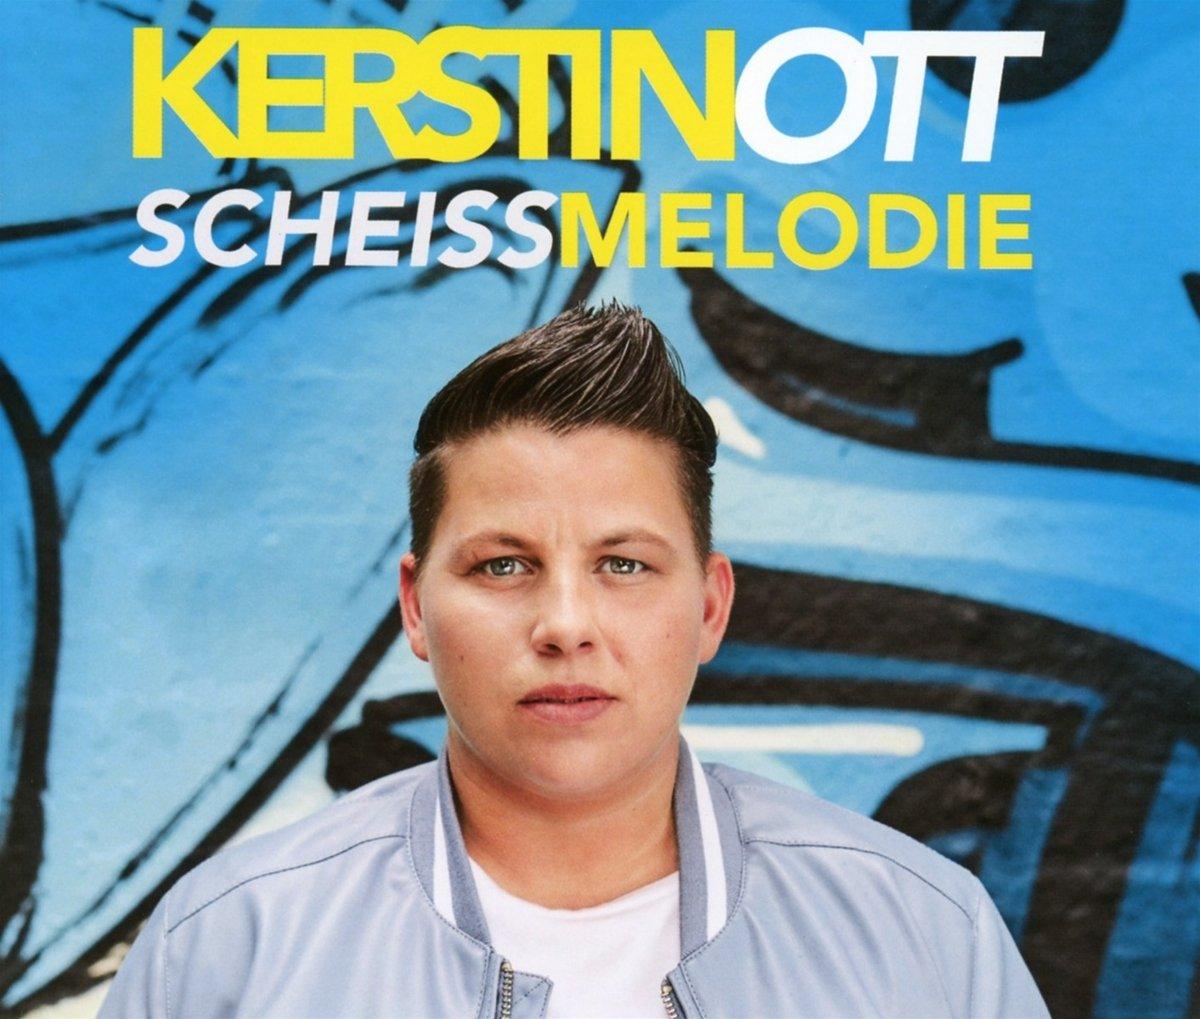 Die Immer Lacht 2 Track Stereoact Feat Kerstin Ott Amazonde